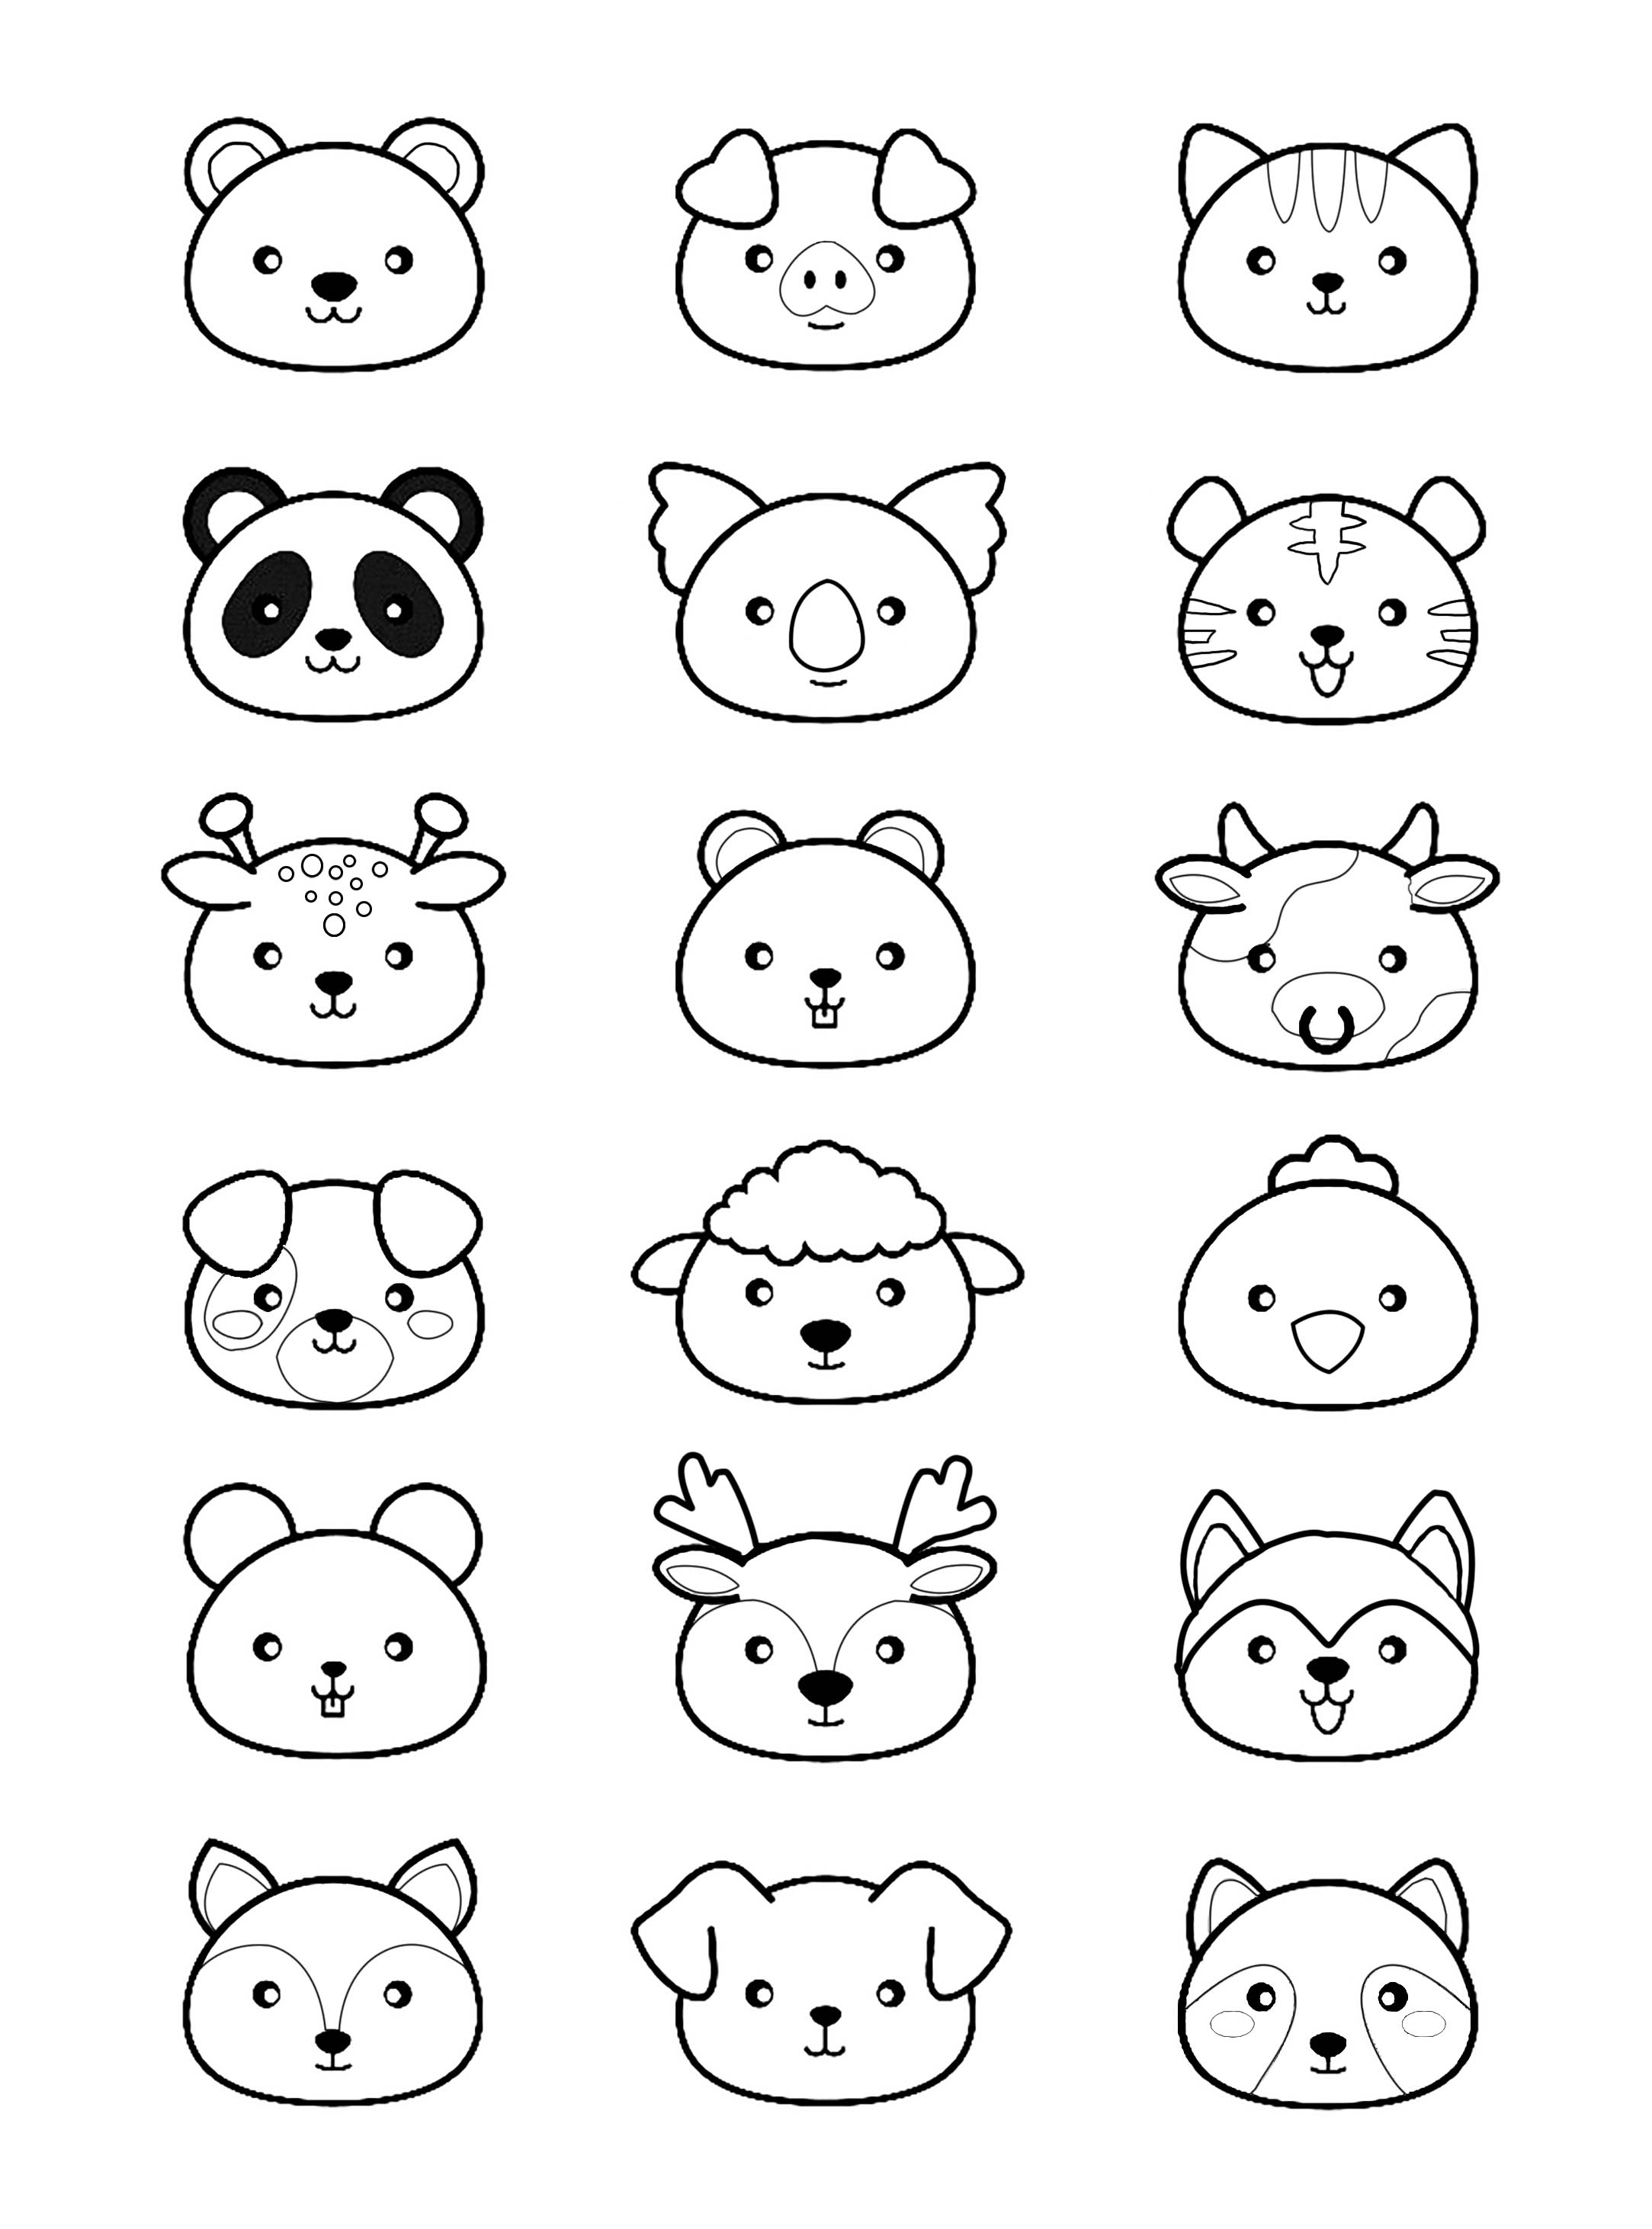 Panda 72097 panda disegni da colorare per adulti - Pagine da colorare pesci per adulti ...